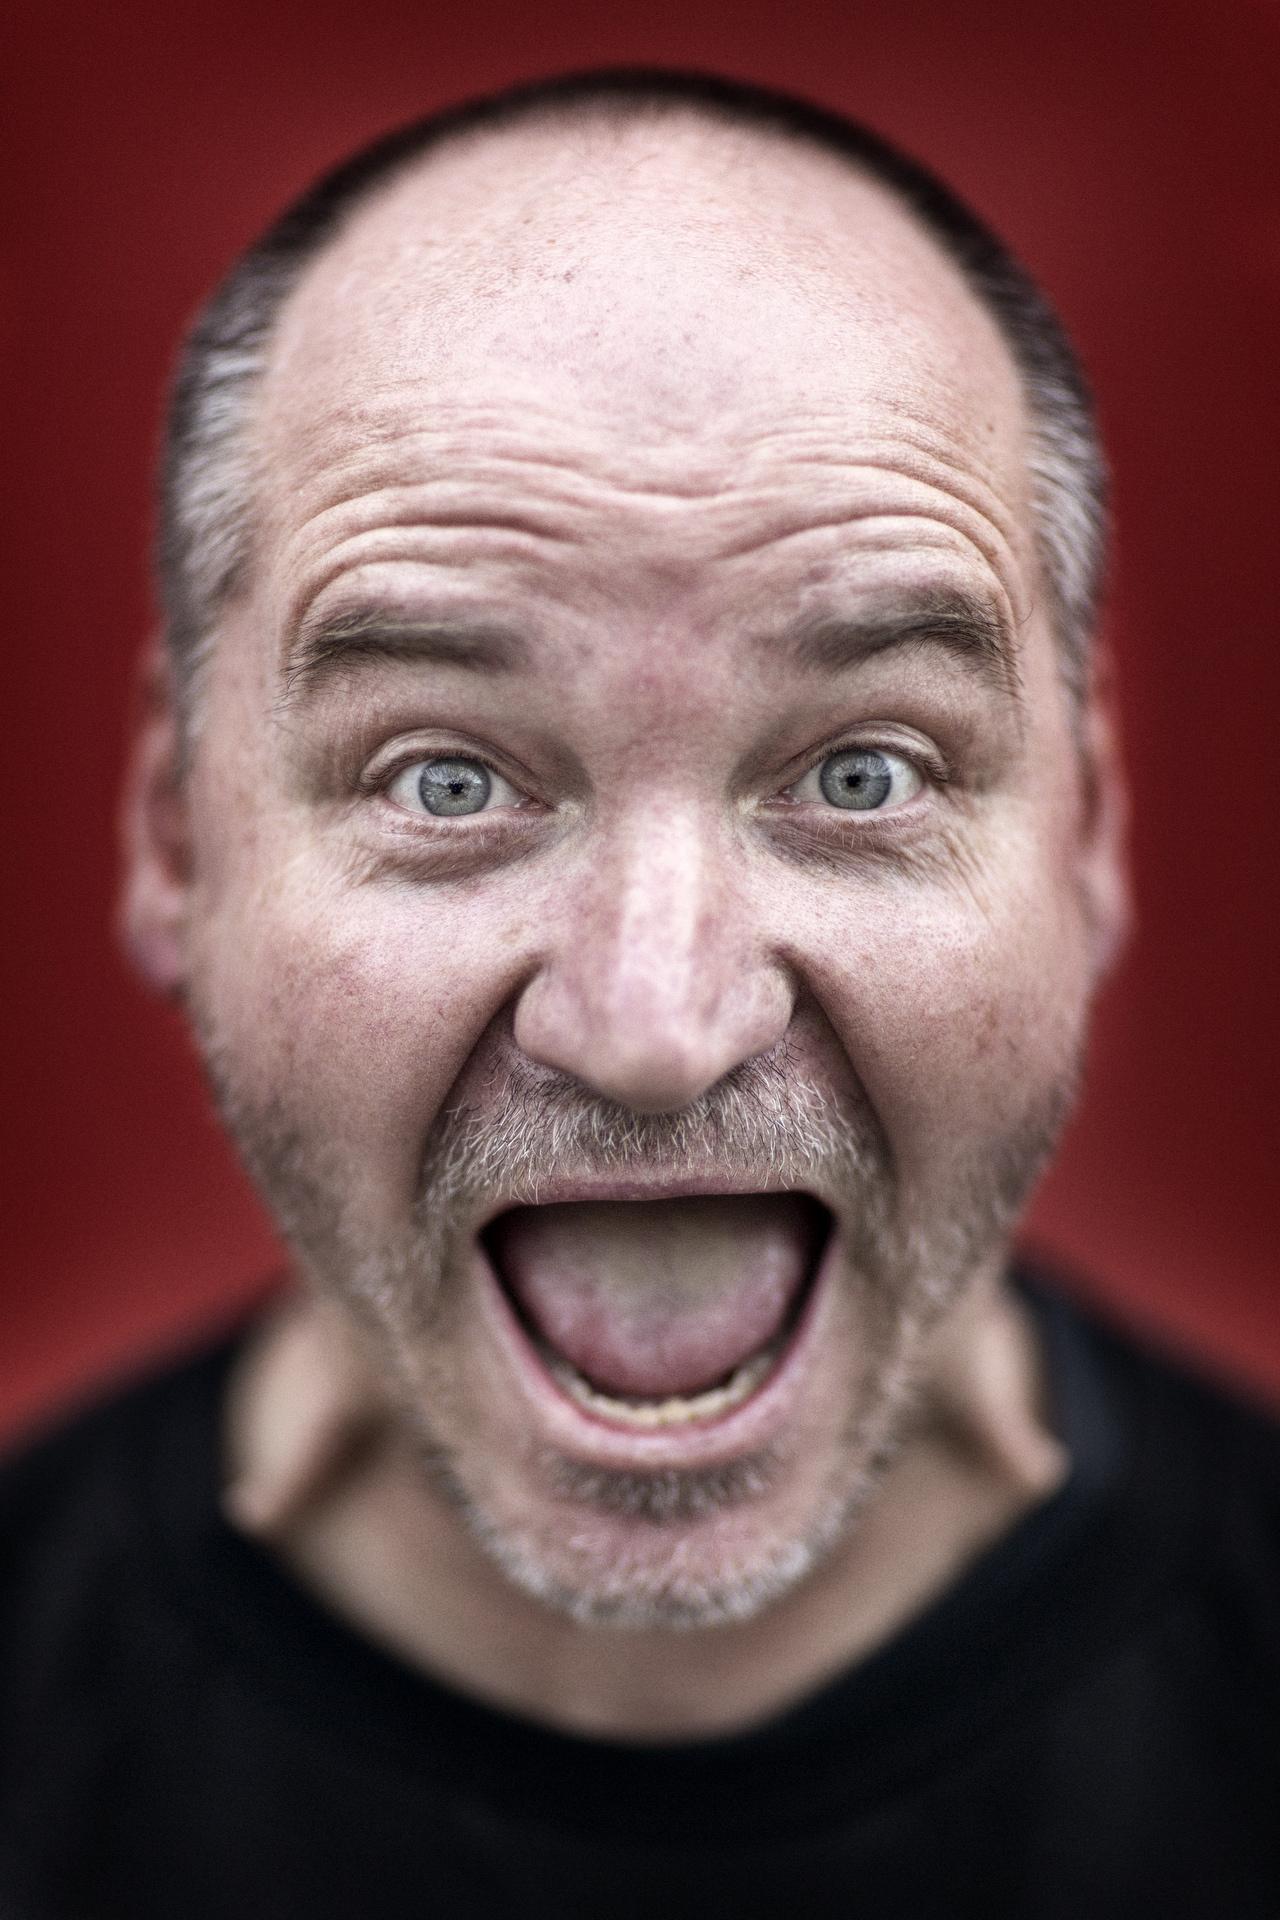 Sydney portrait photographer, personal branding, head shots, corporate photography